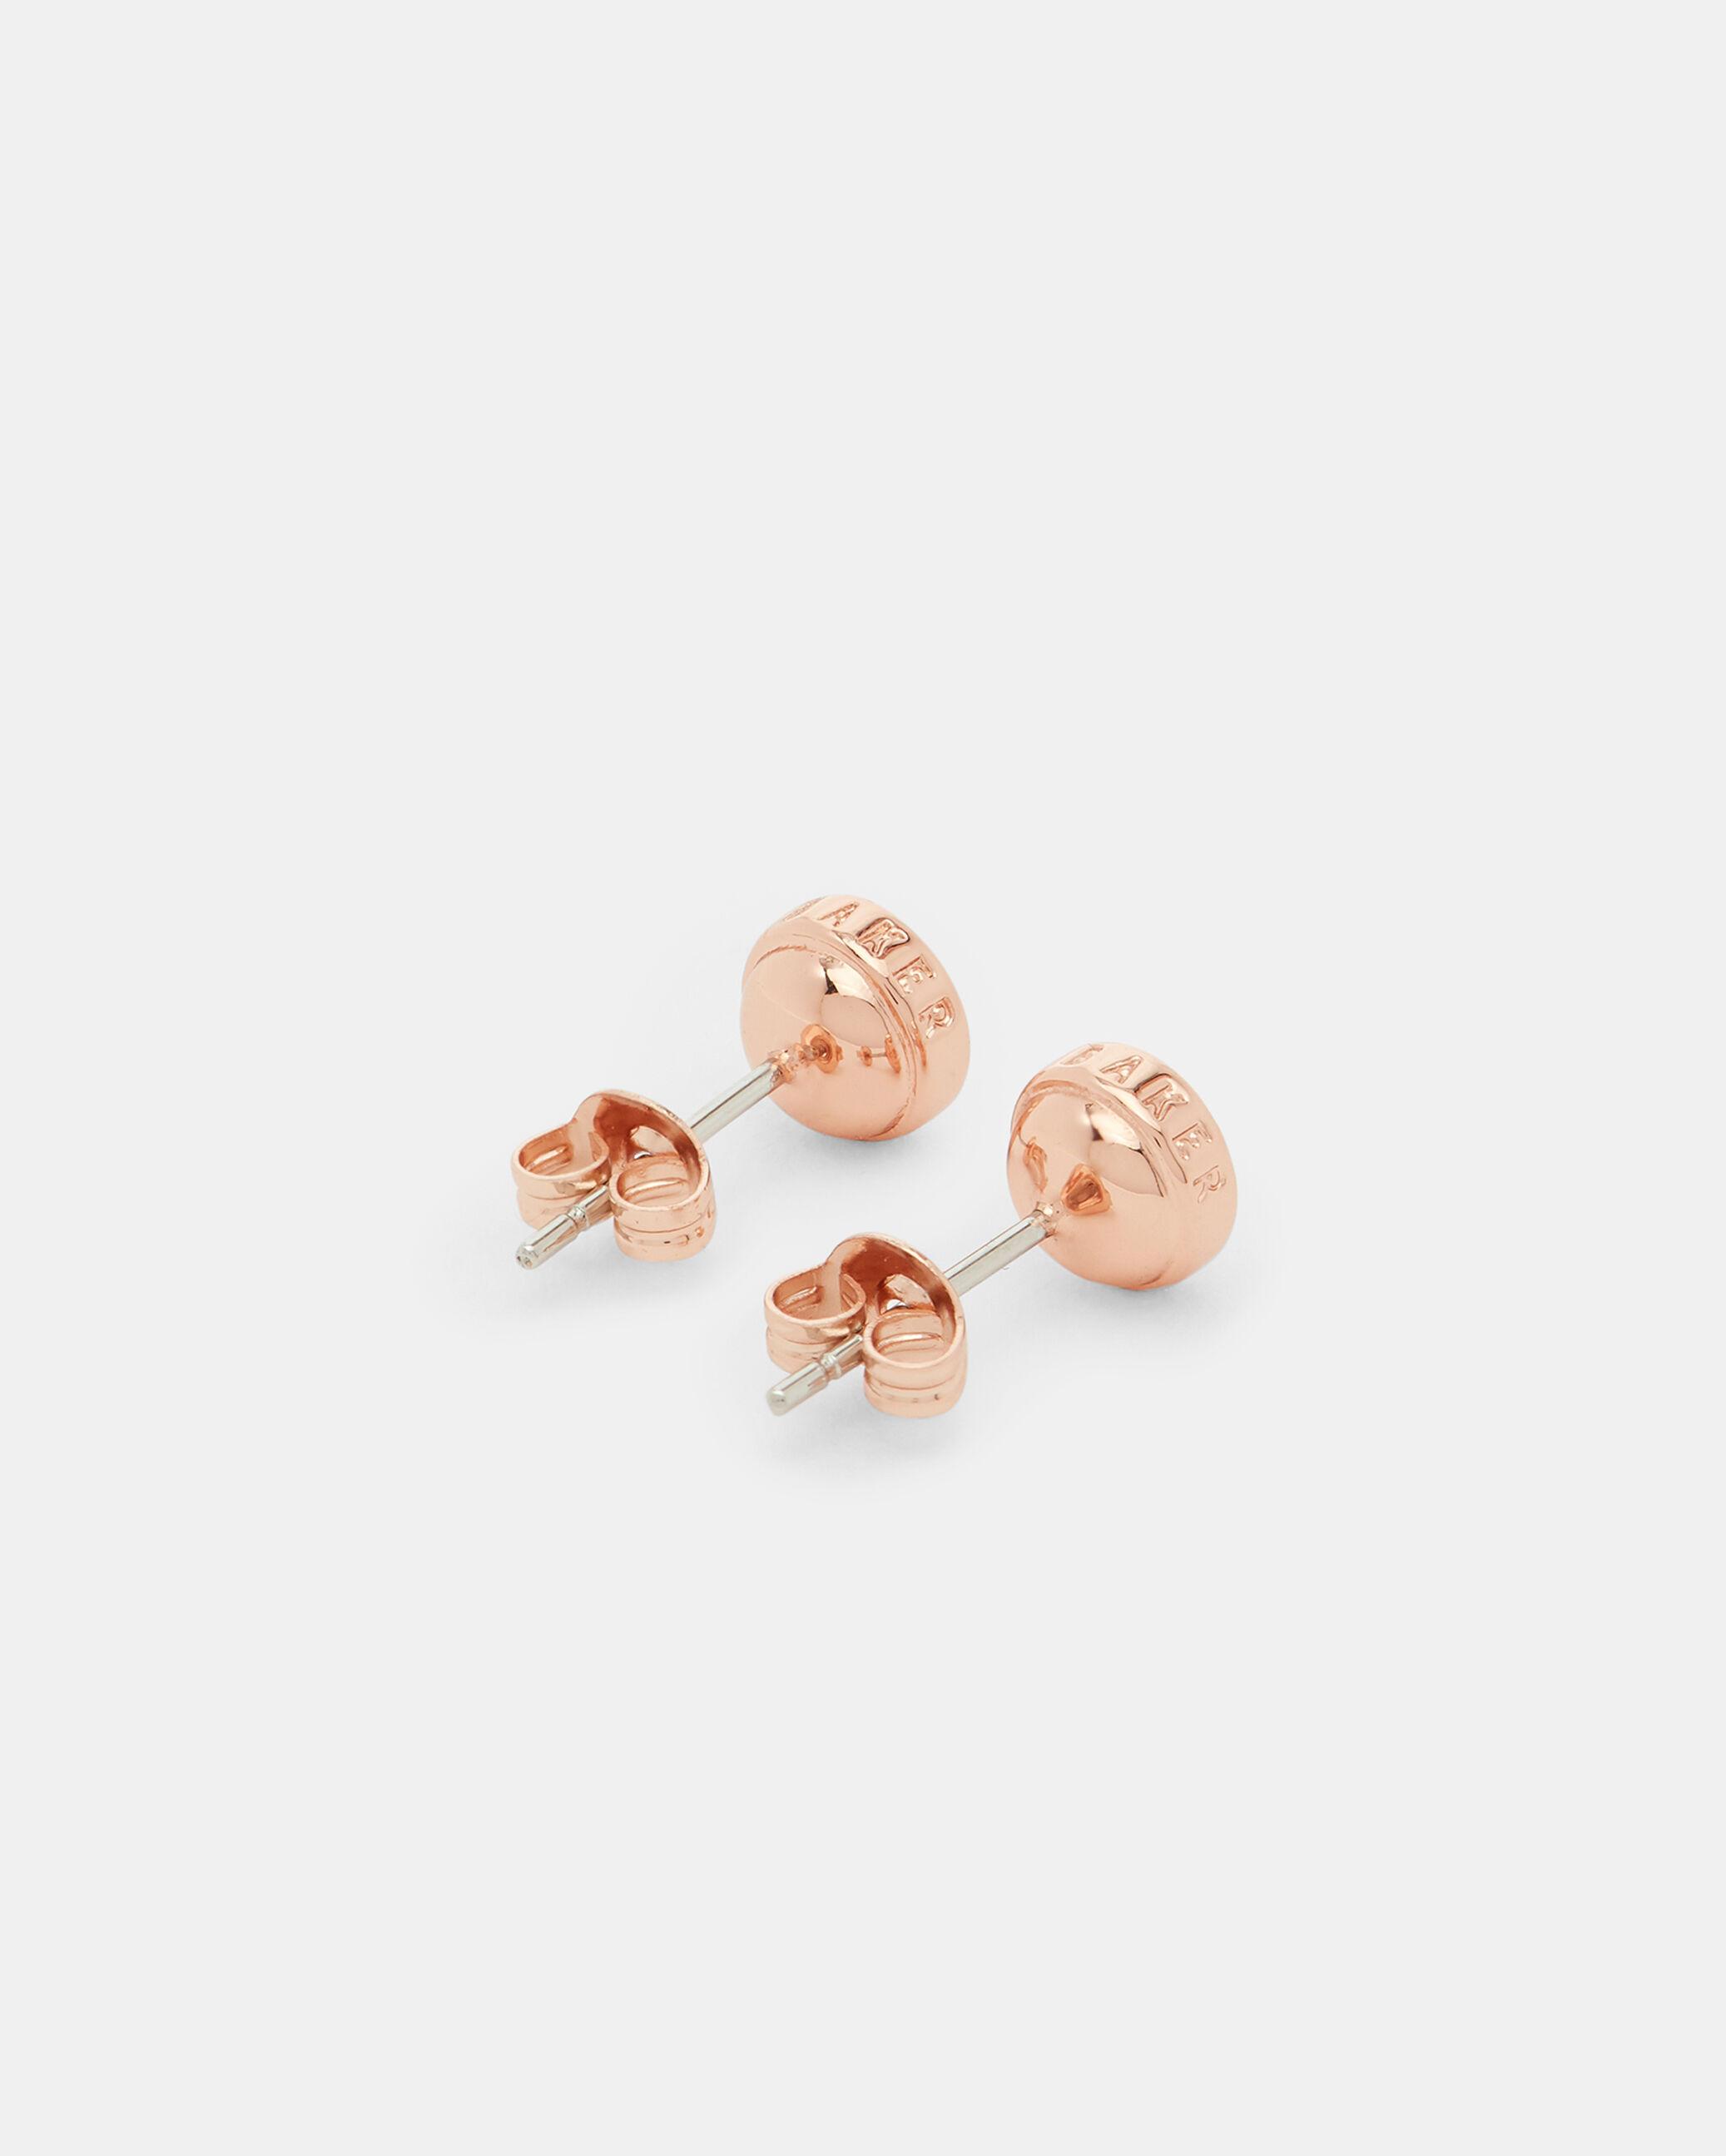 Ted Baker Round Stud Earrings